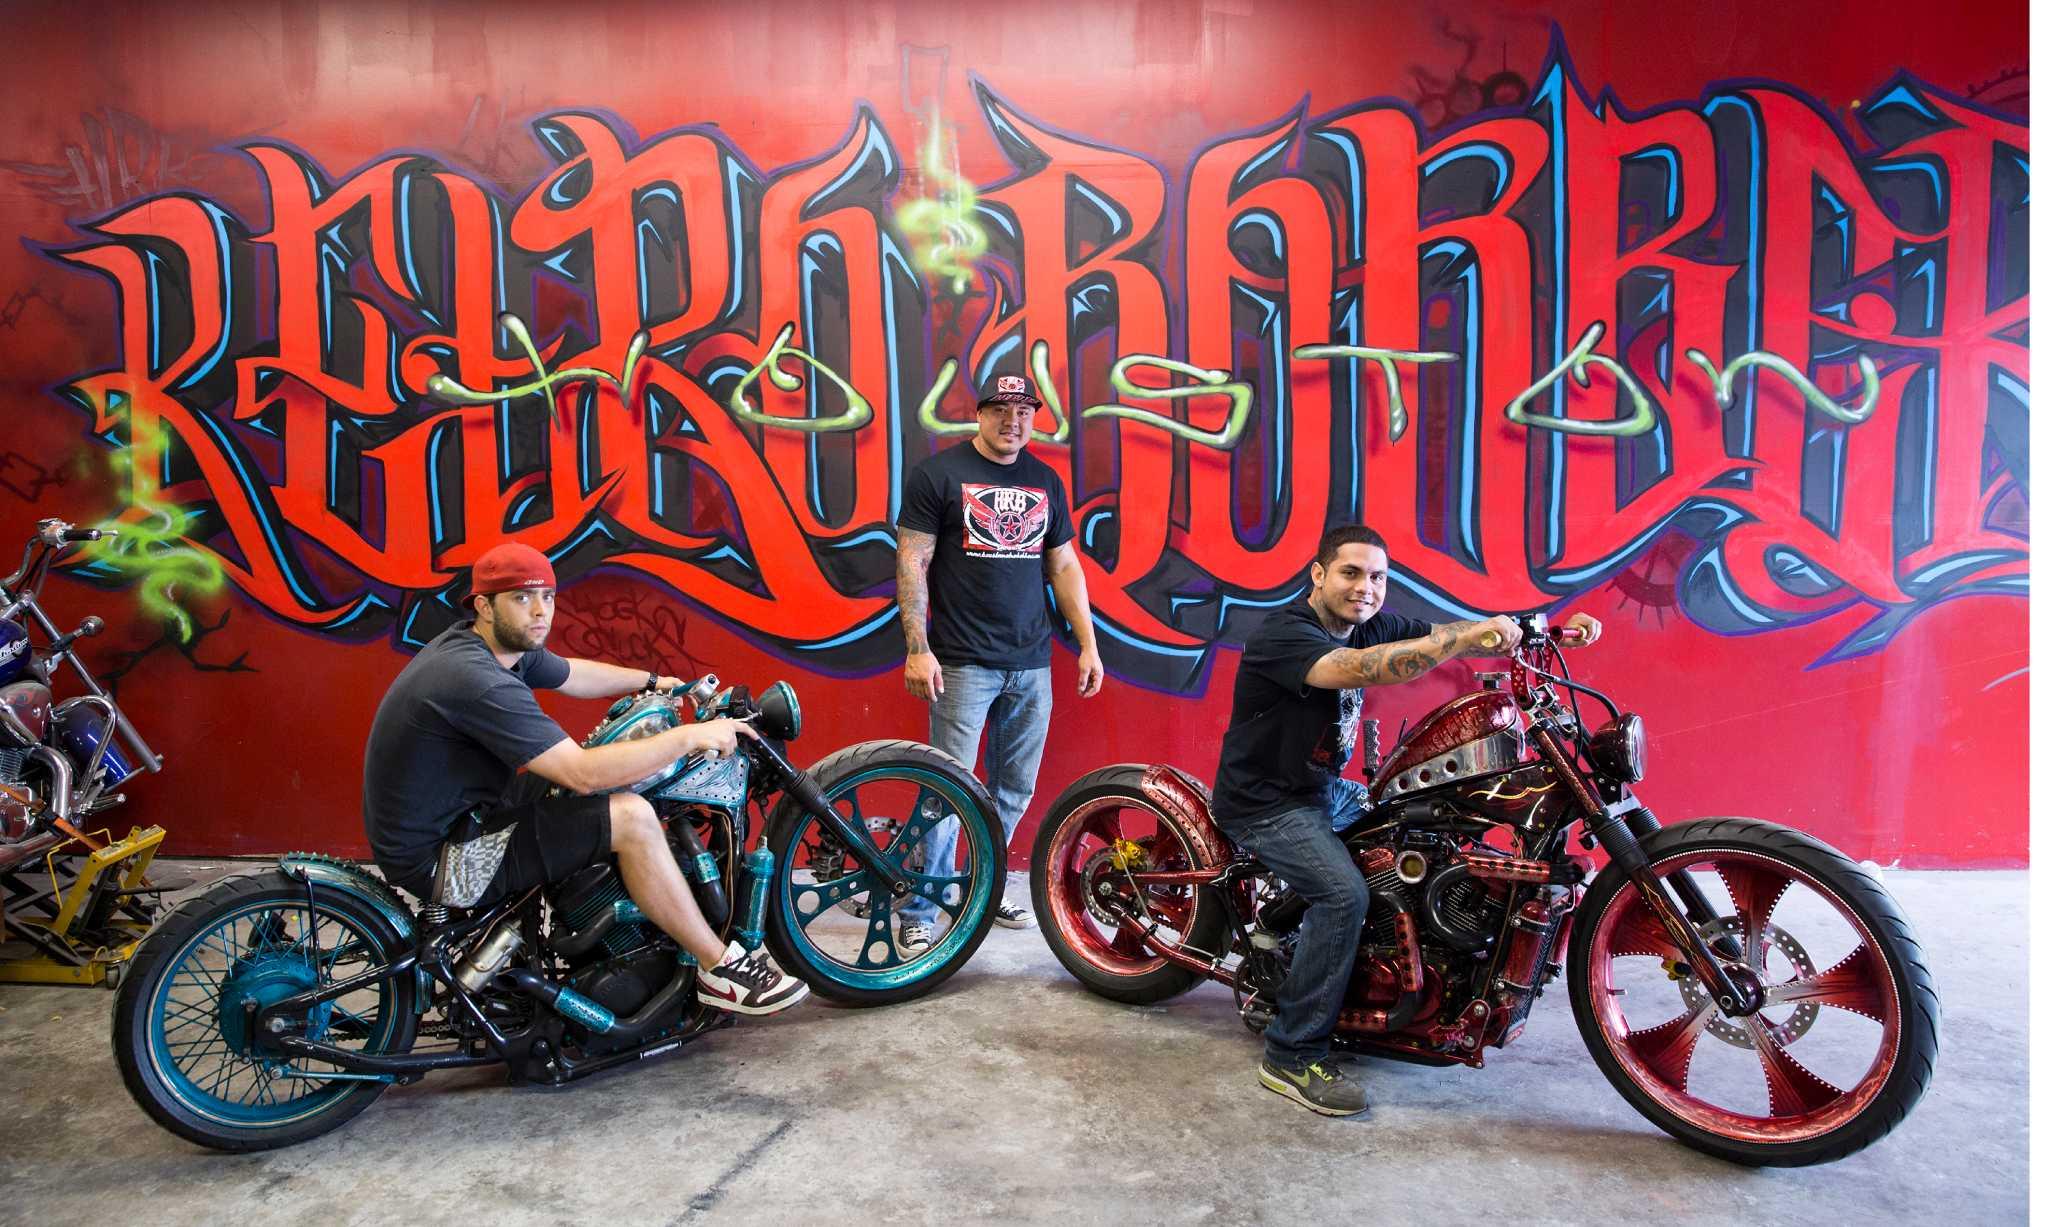 Motorcycle customizer rides high - HoustonChronicle com